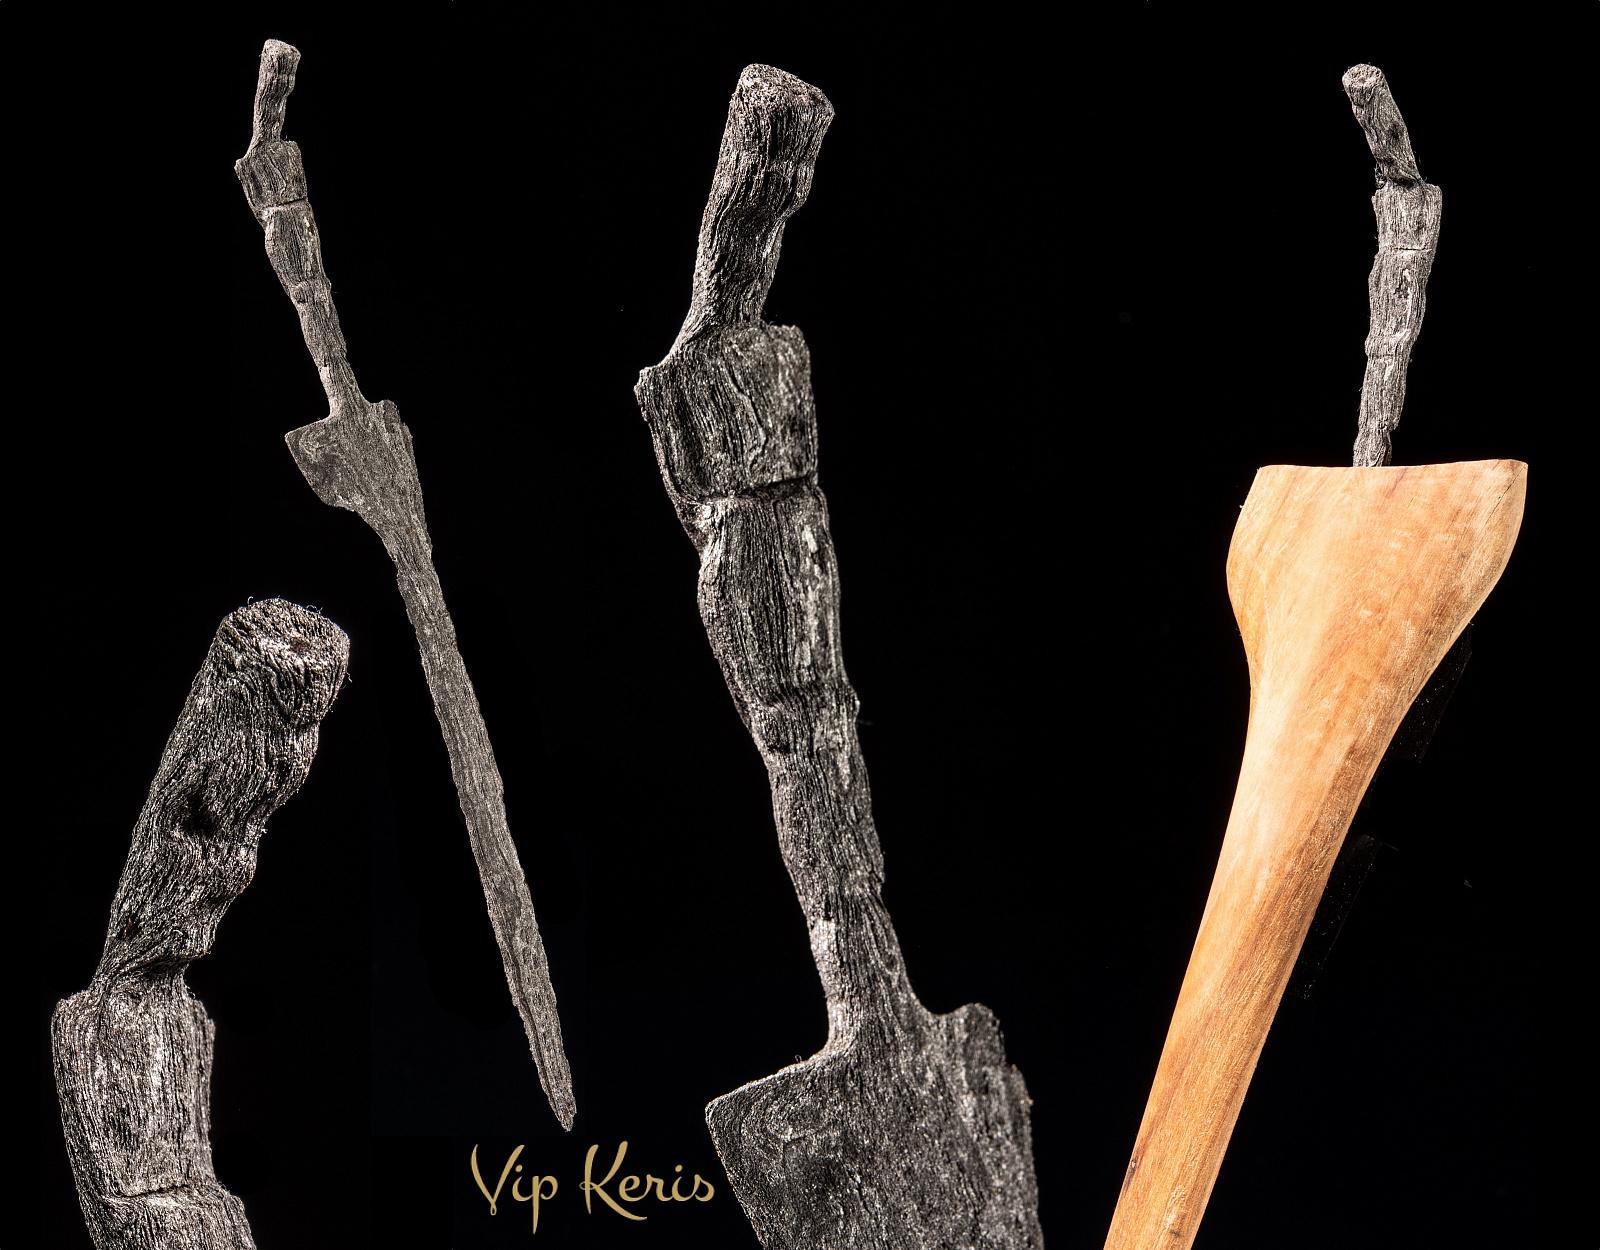 Прямой Кинжал Крис Sajen 12 век  фото VipKeris